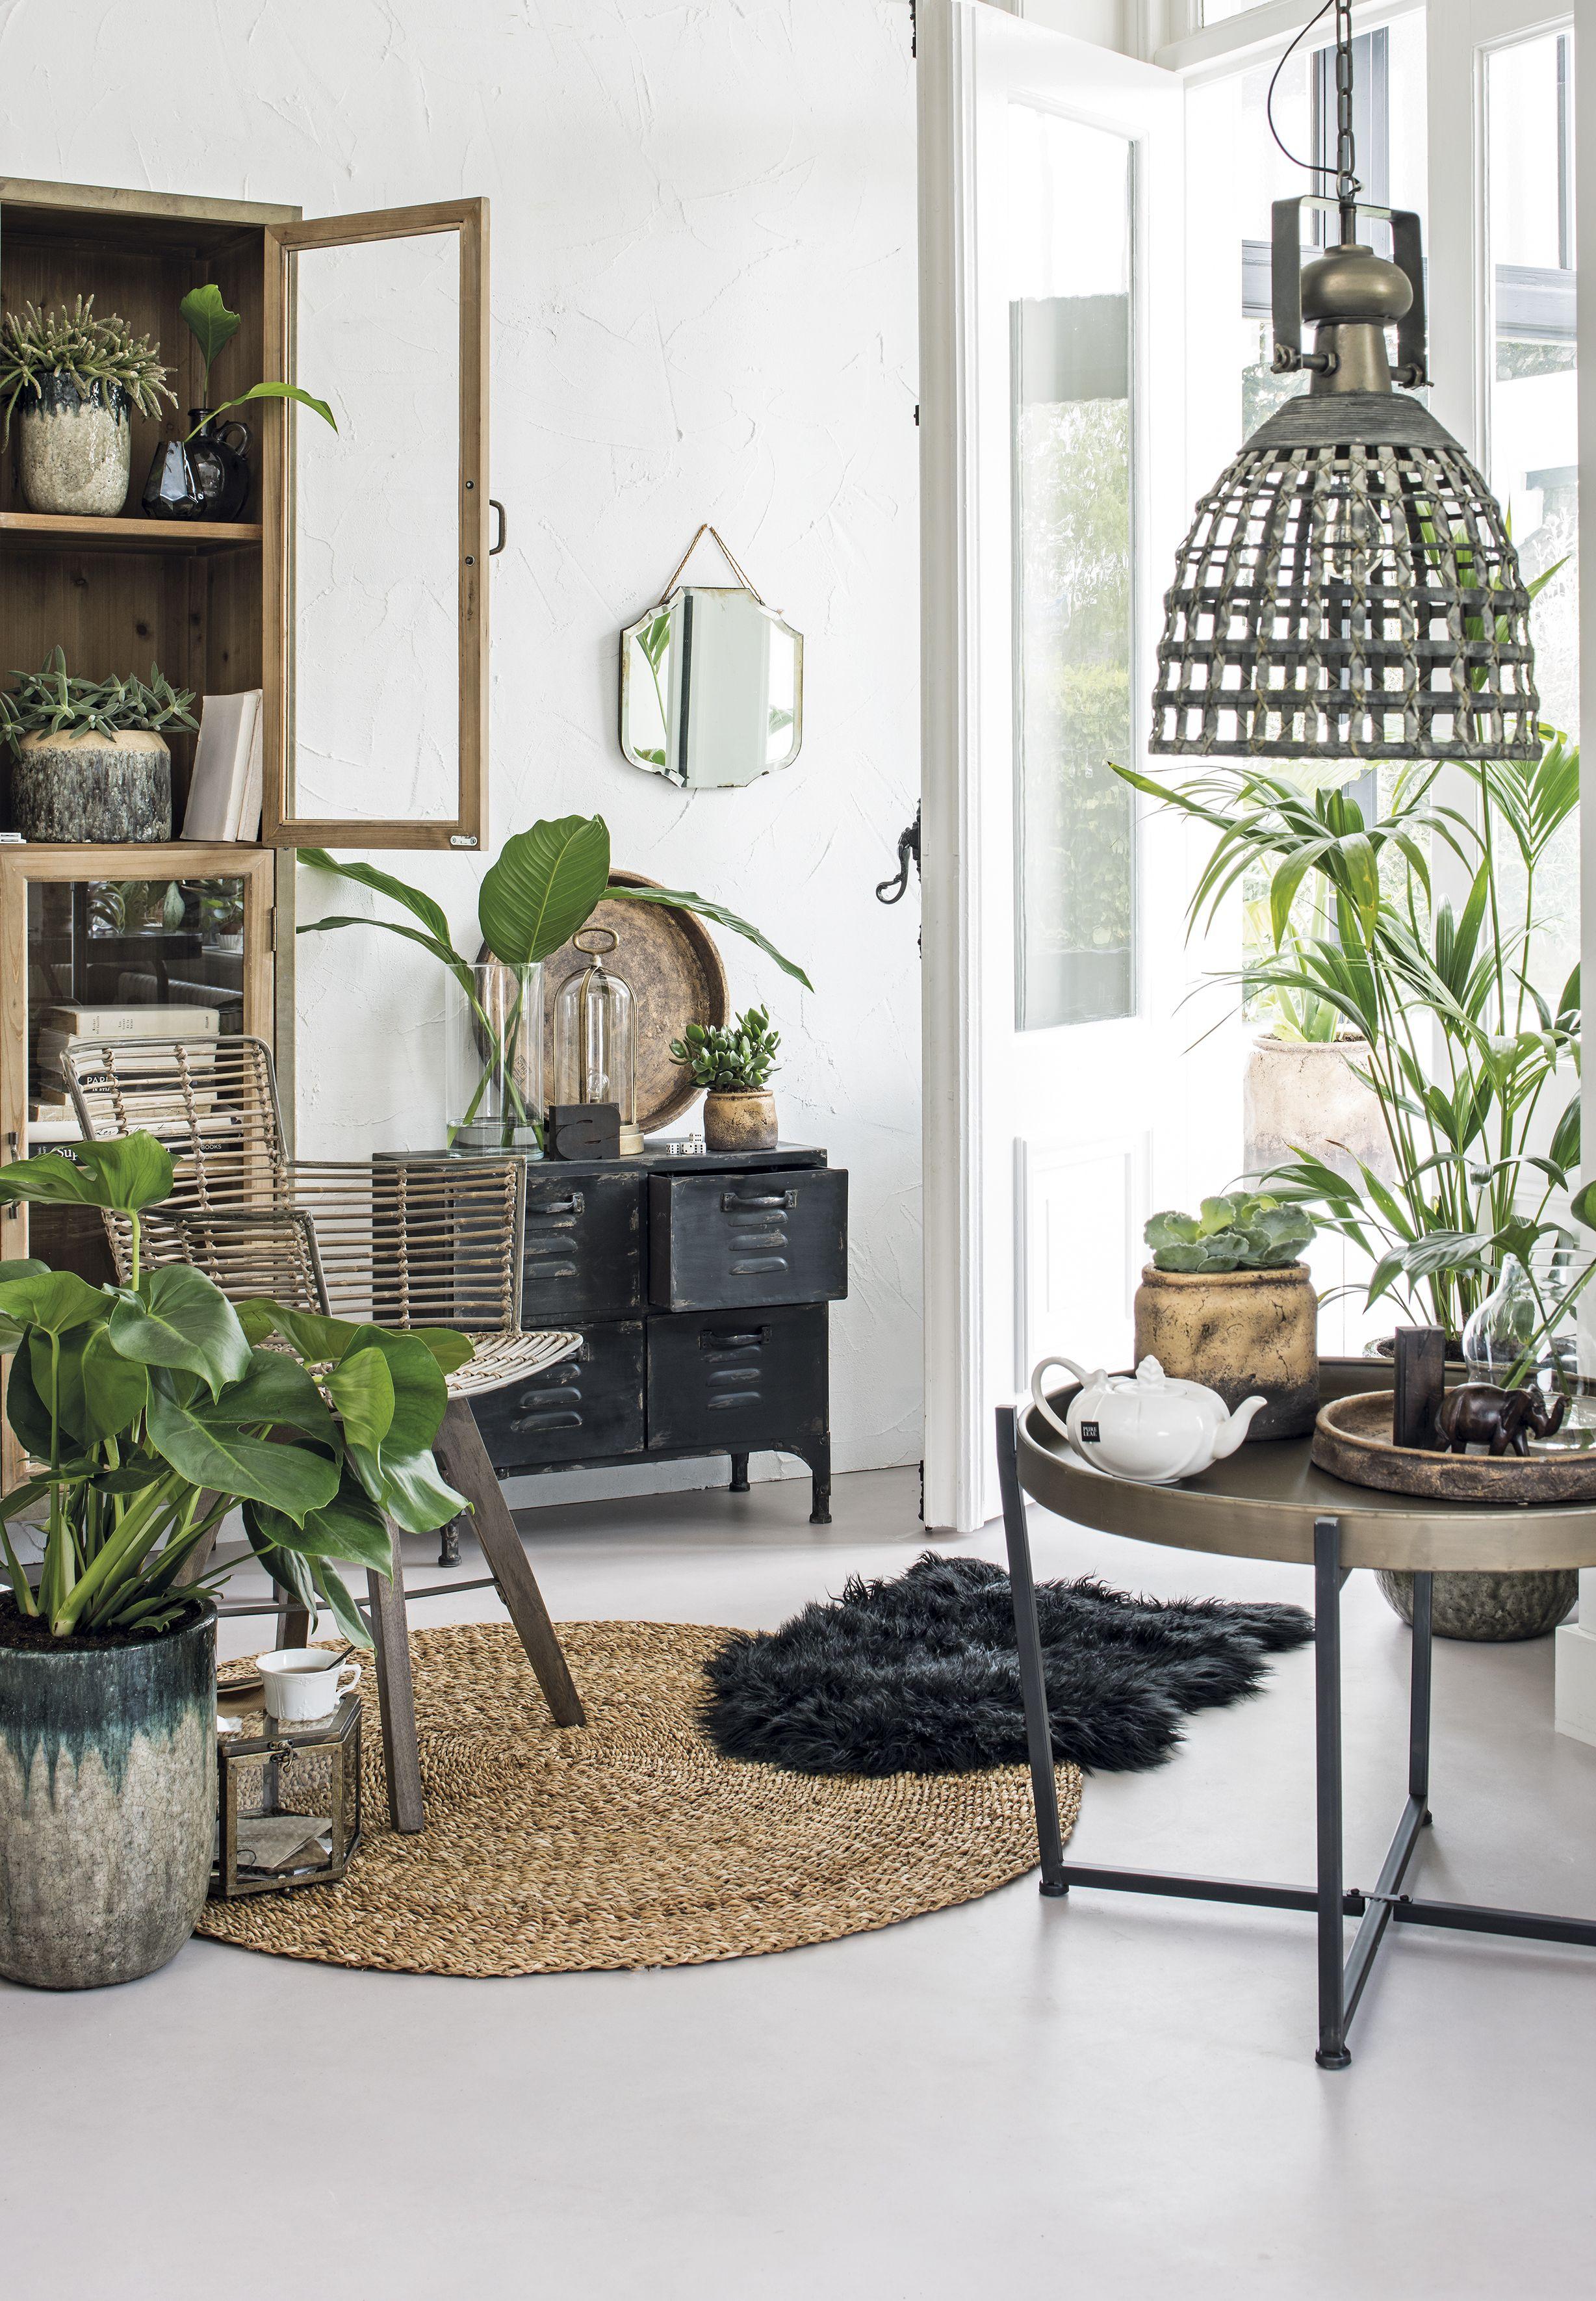 Stoere woonkamer #kamerplanten #intratuin | Urban Industrial Design ...